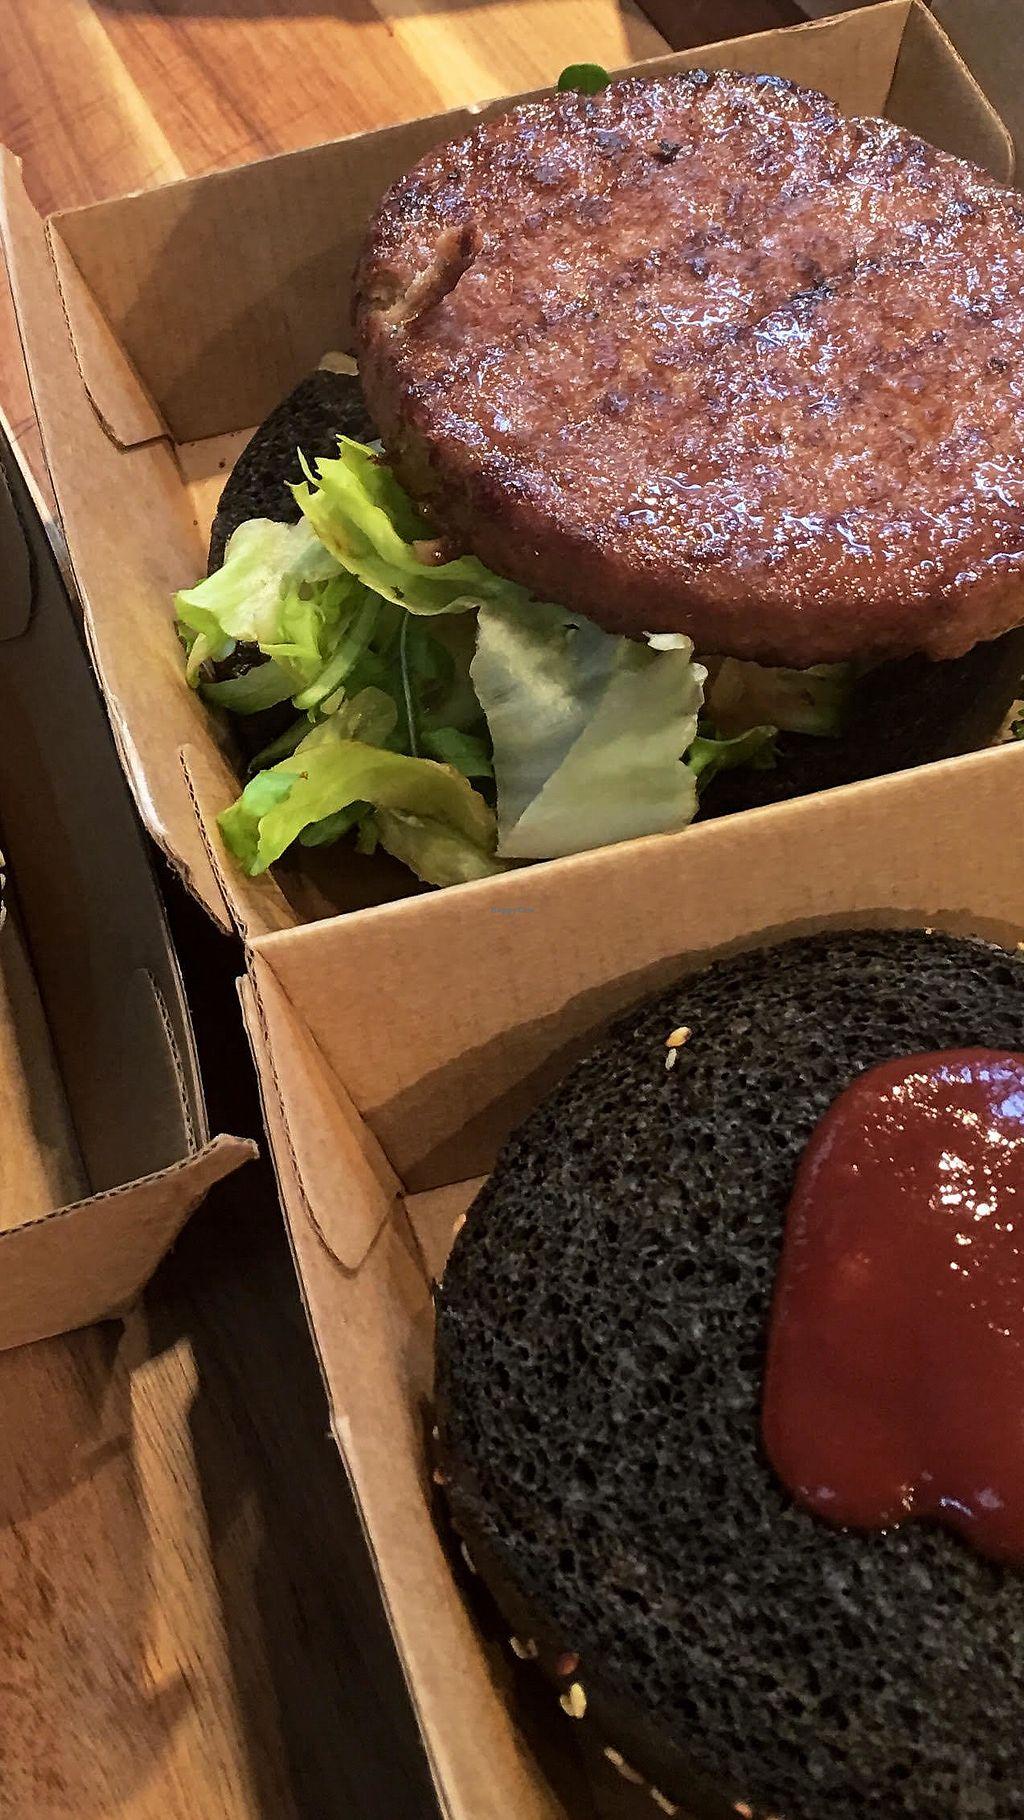 "Photo of Vunk Vood at Restaurant Seepintli  by <a href=""/members/profile/VunkVood"">VunkVood</a> <br/>The Black Burger // 100% Vegan! <br/> December 8, 2017  - <a href='/contact/abuse/image/106322/333371'>Report</a>"